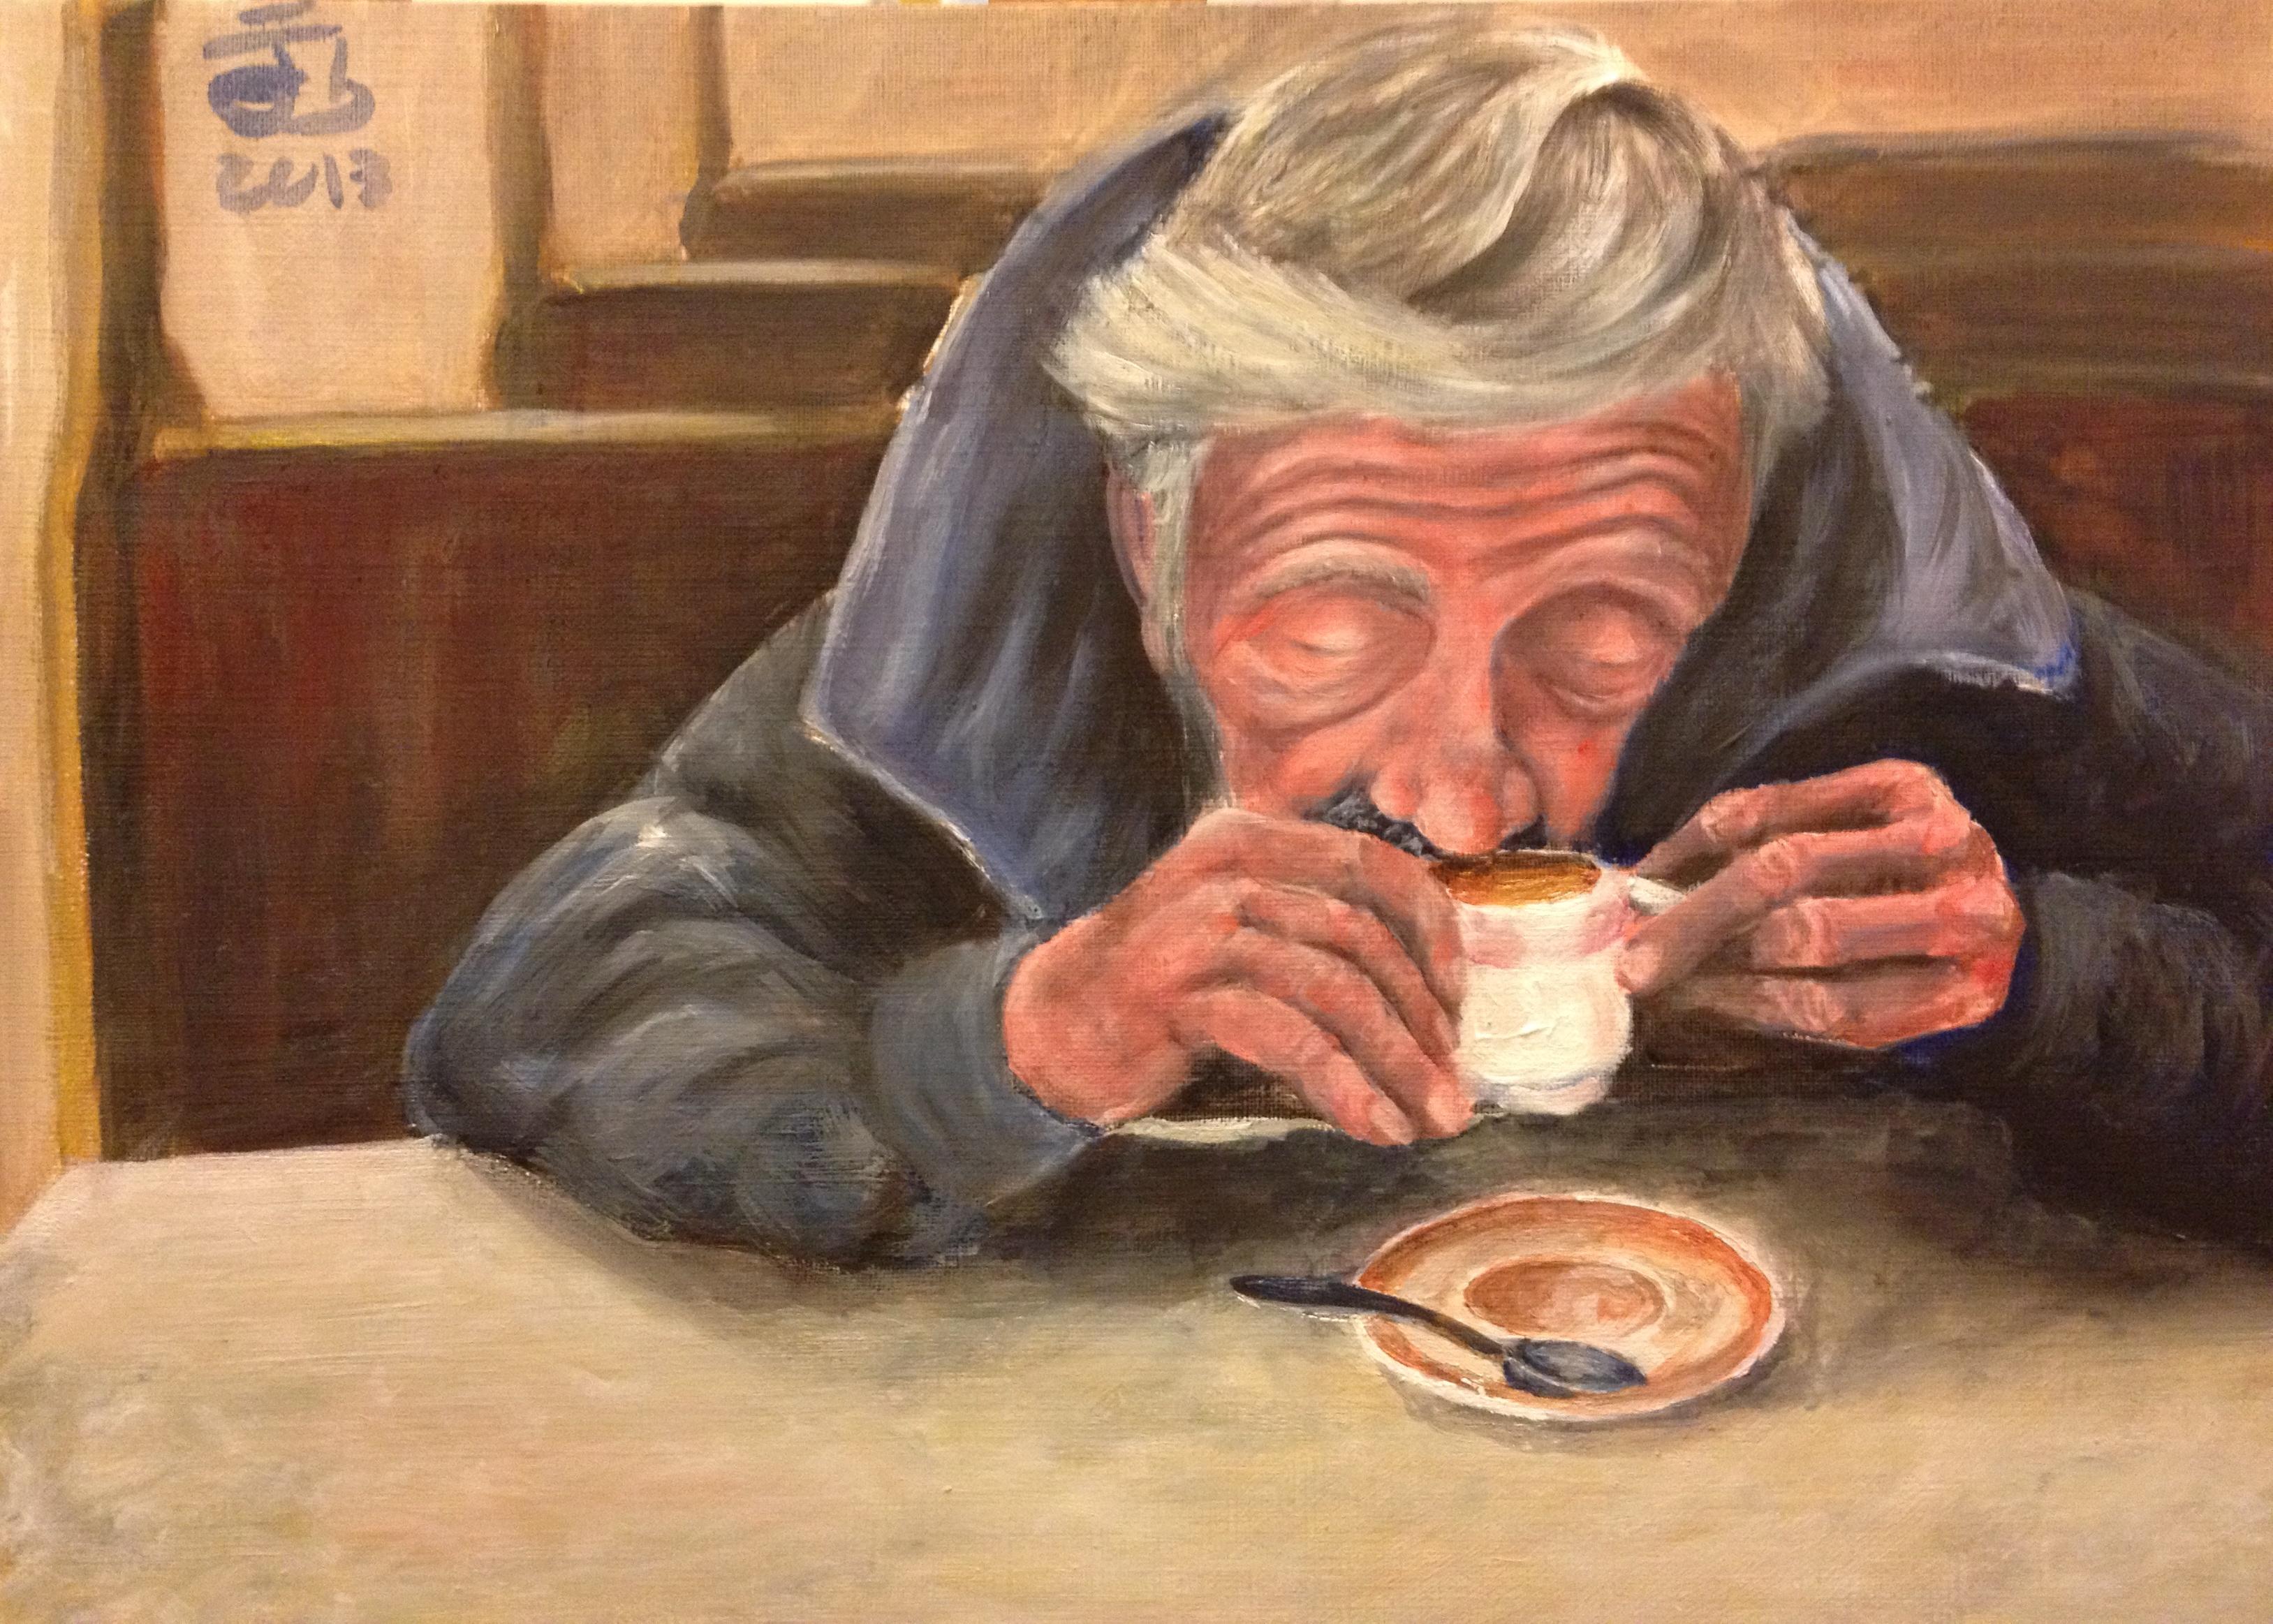 Hombre mayor tomando leche materna - 1 part 5